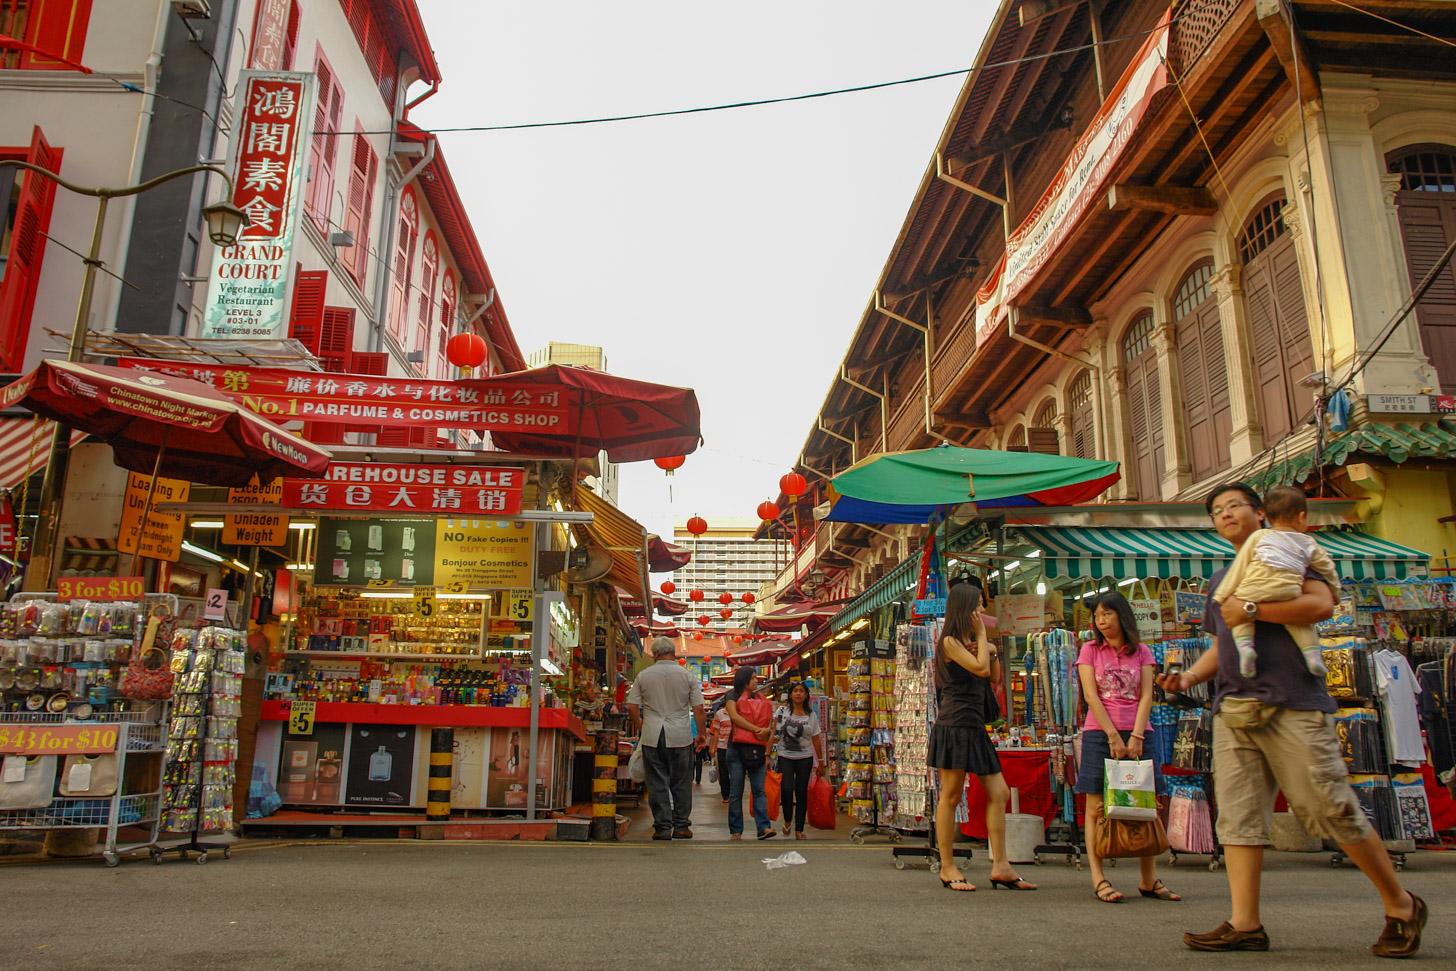 Onze favoriete winkelwijk in Singapore is Chinatown